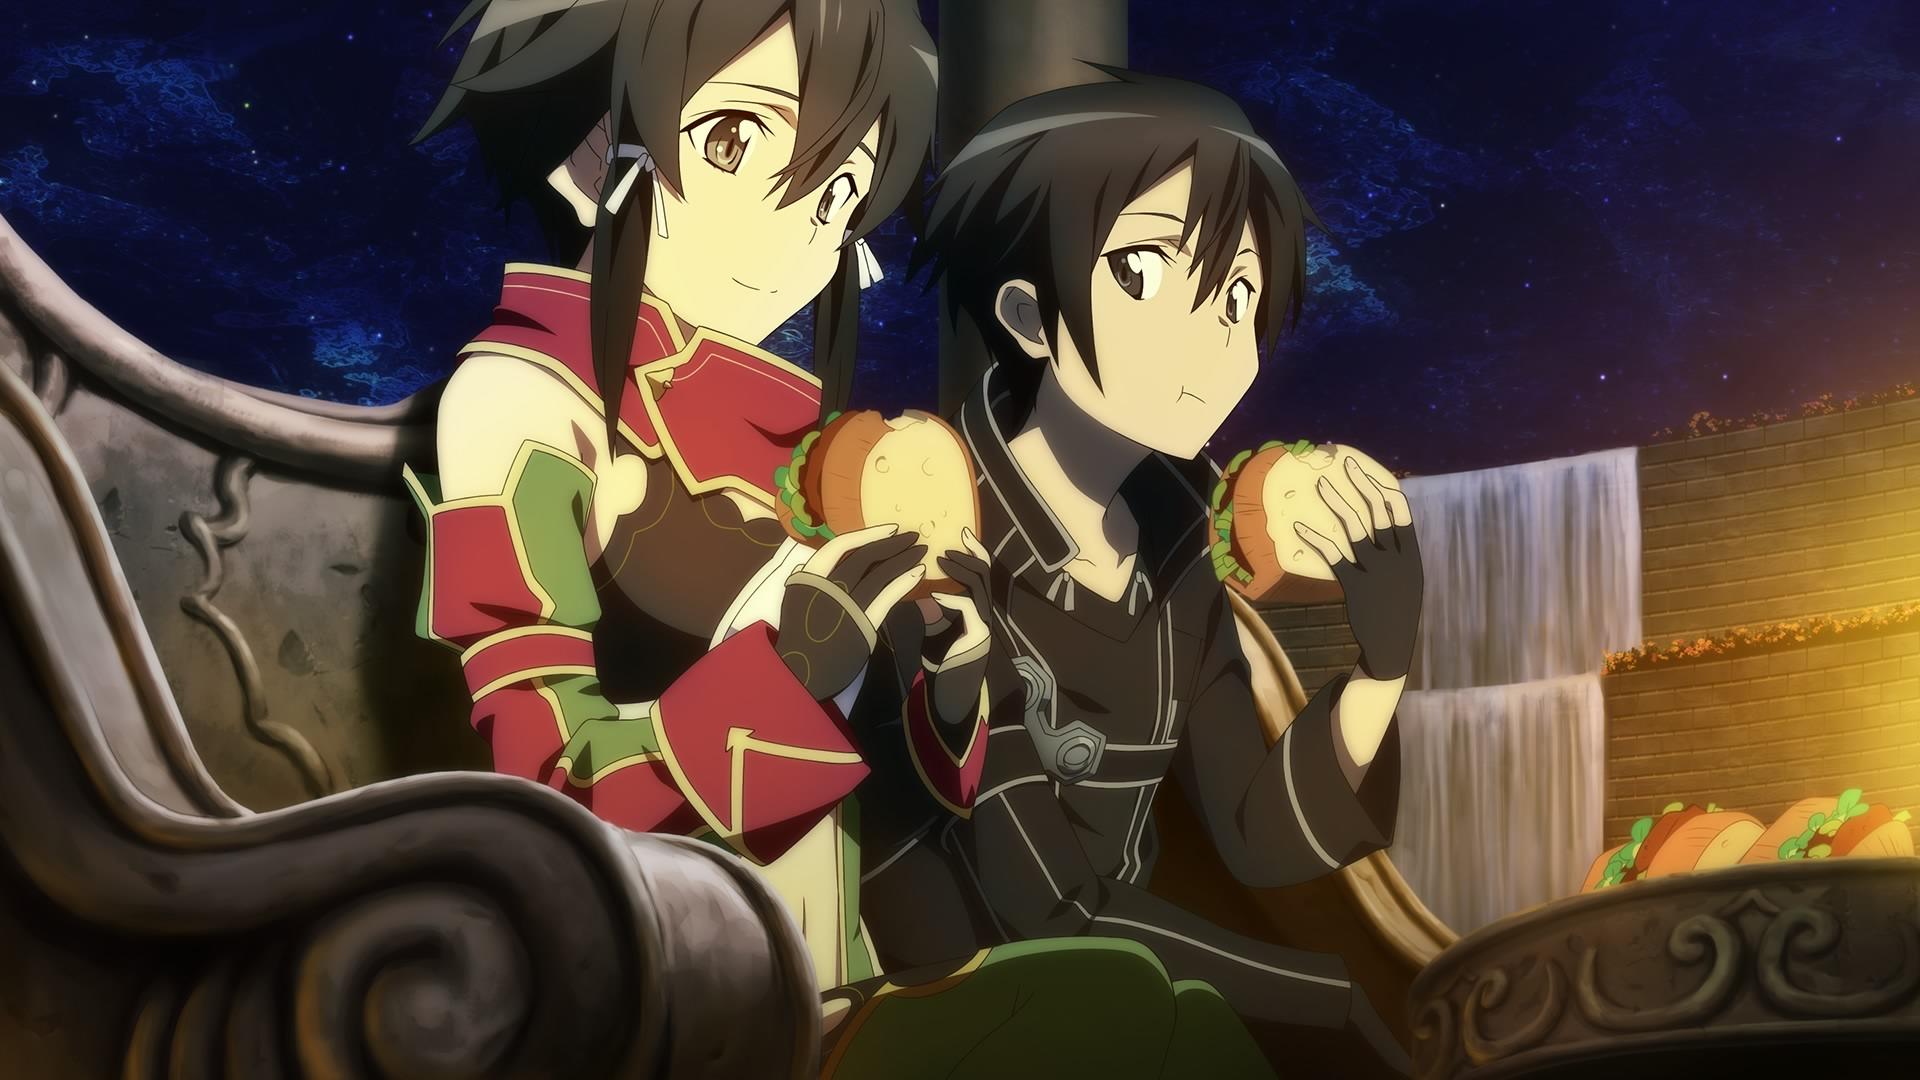 Sinon And Kirito Eating In Hollow Area